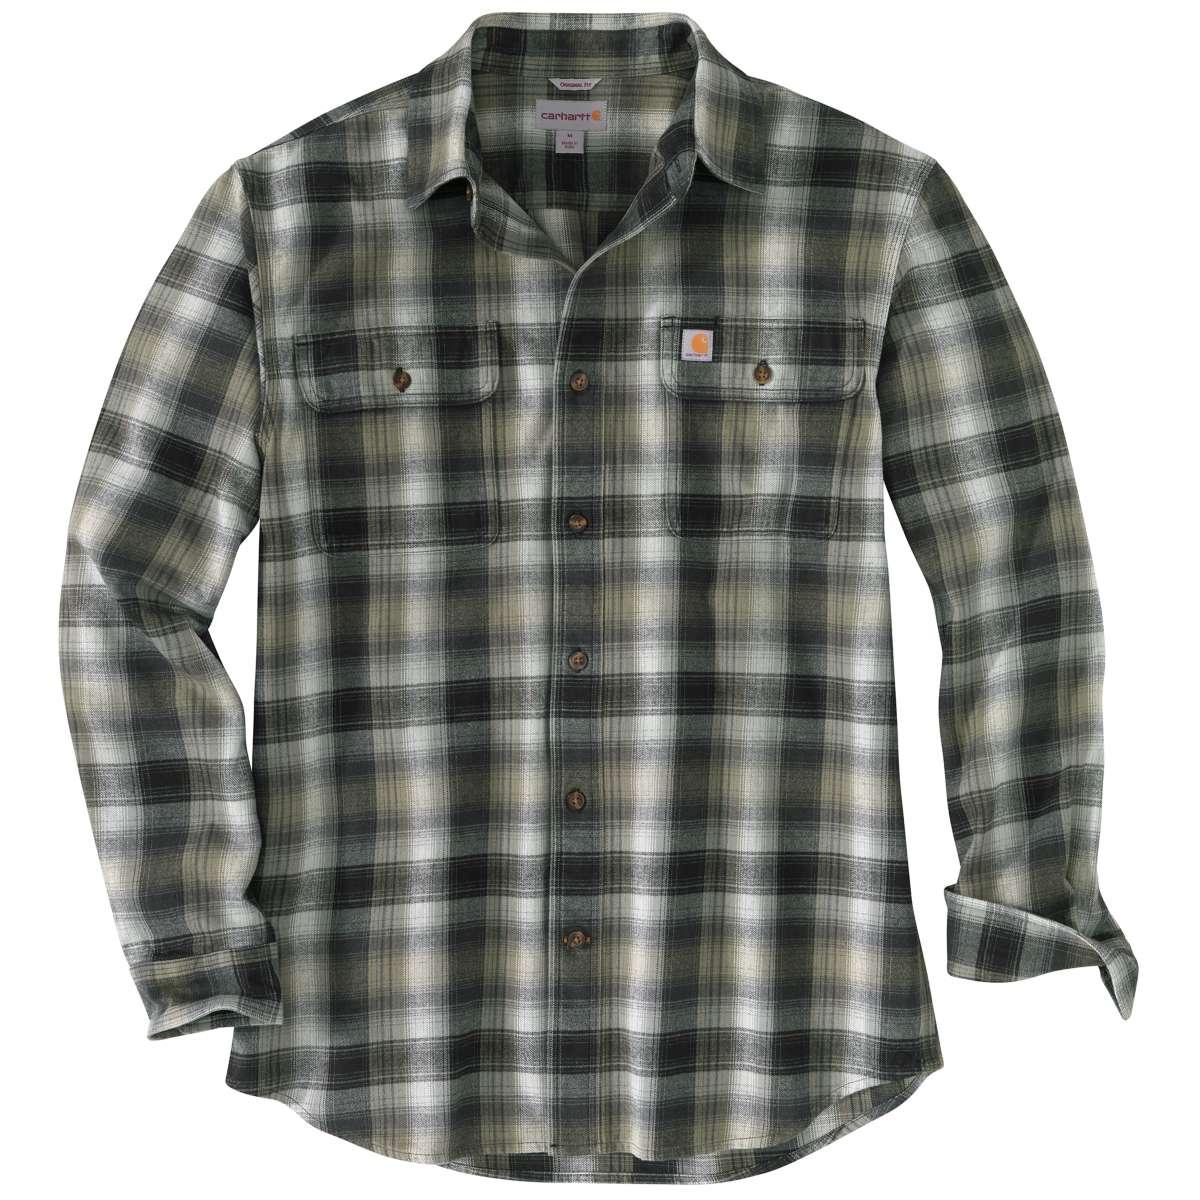 Carhartt Men's Hubbard Flannel Long-Sleeve Shirt, Extended Sizes - Black, 3XL